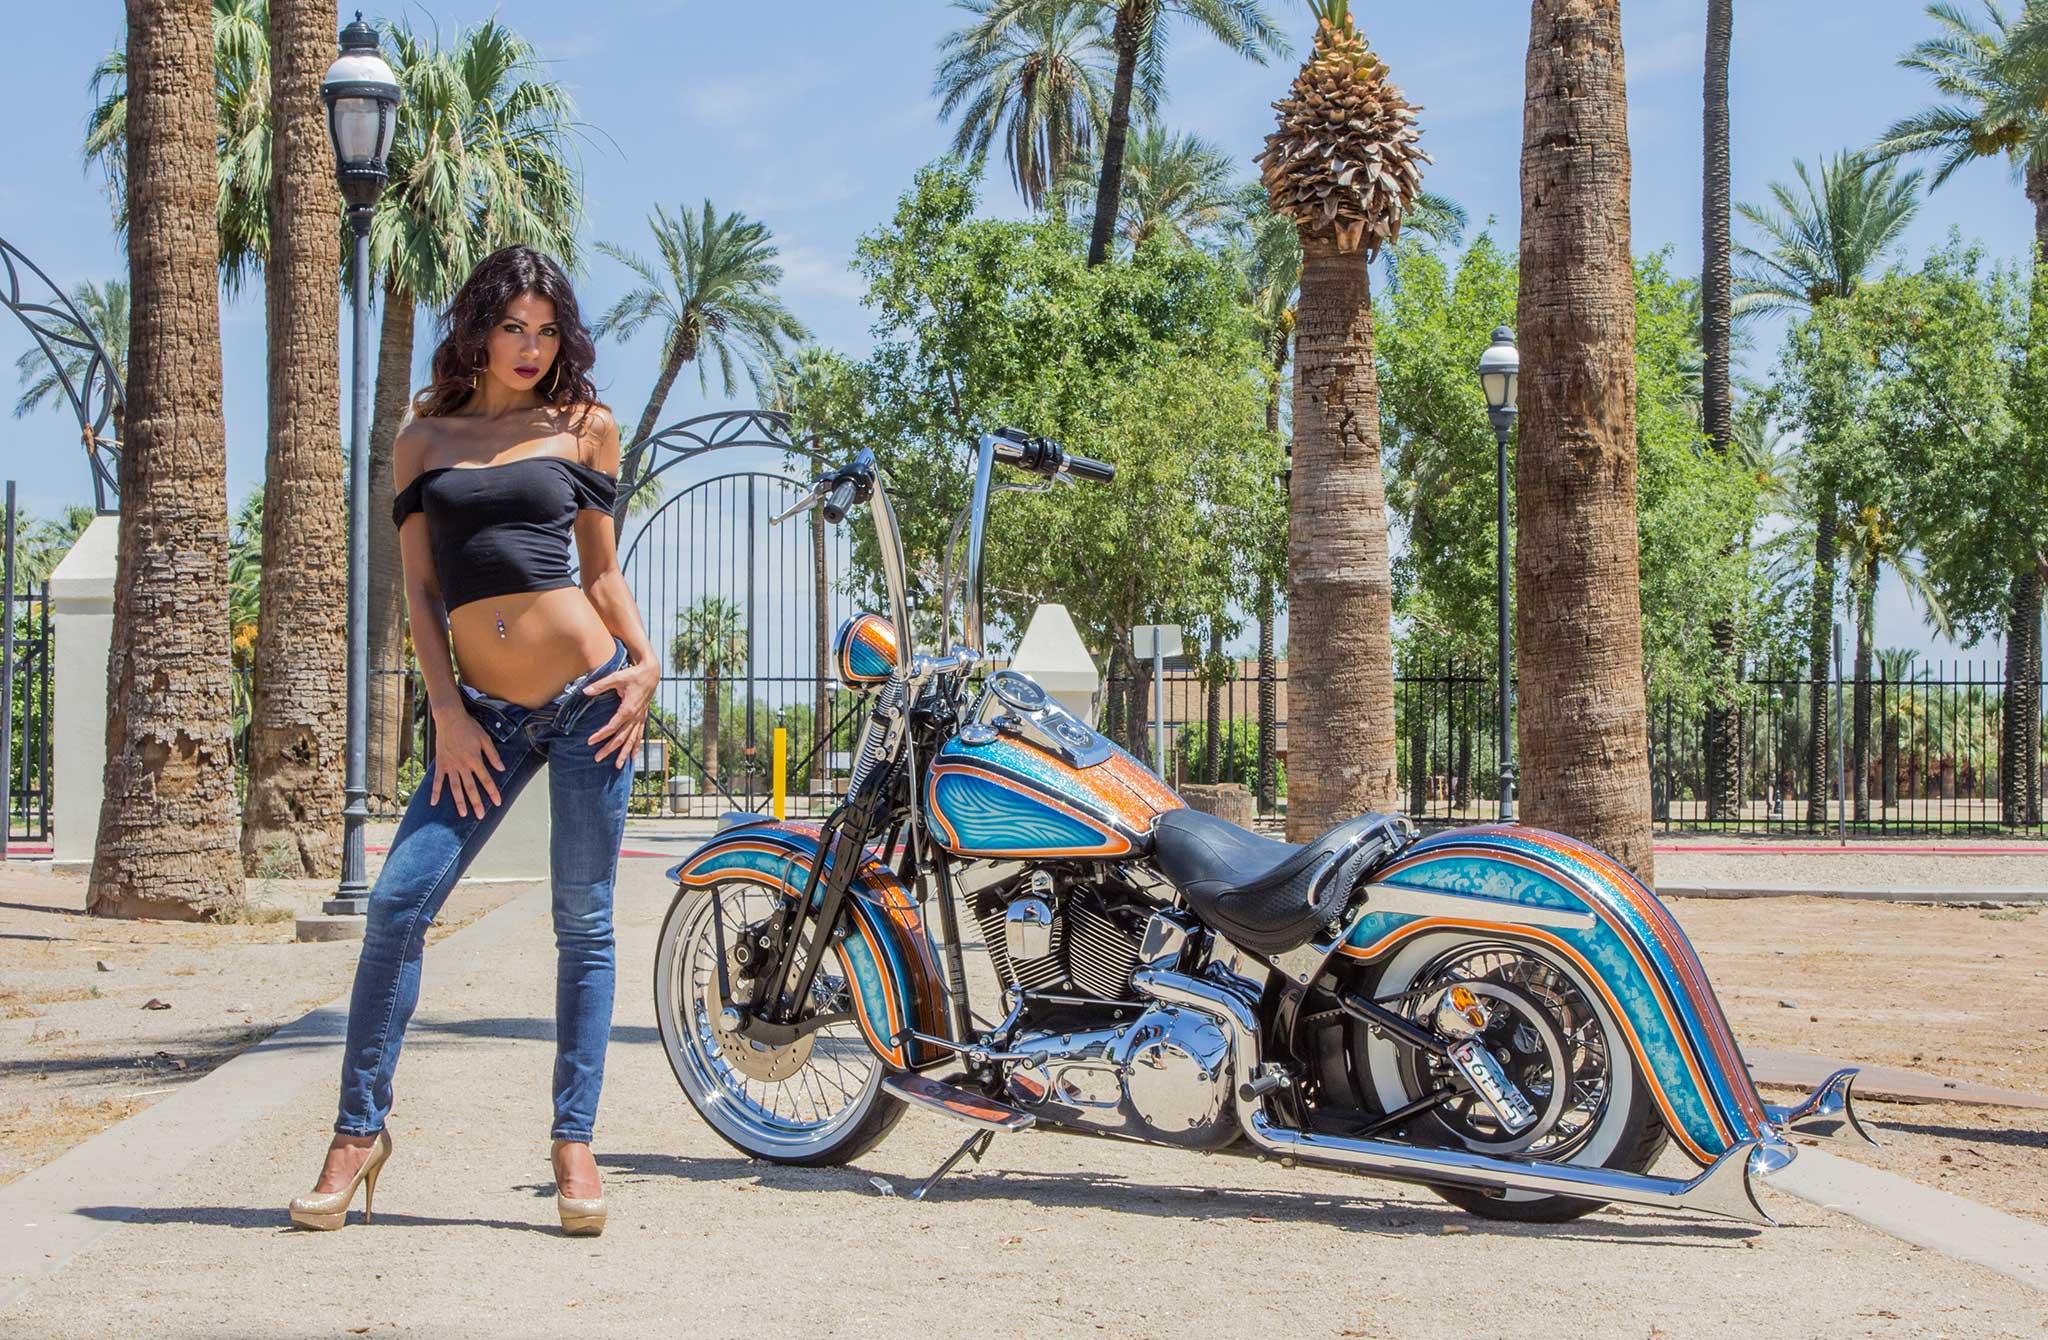 Pin by Axel Rock on motos   Super bikes, Hot biker, Hot bikes